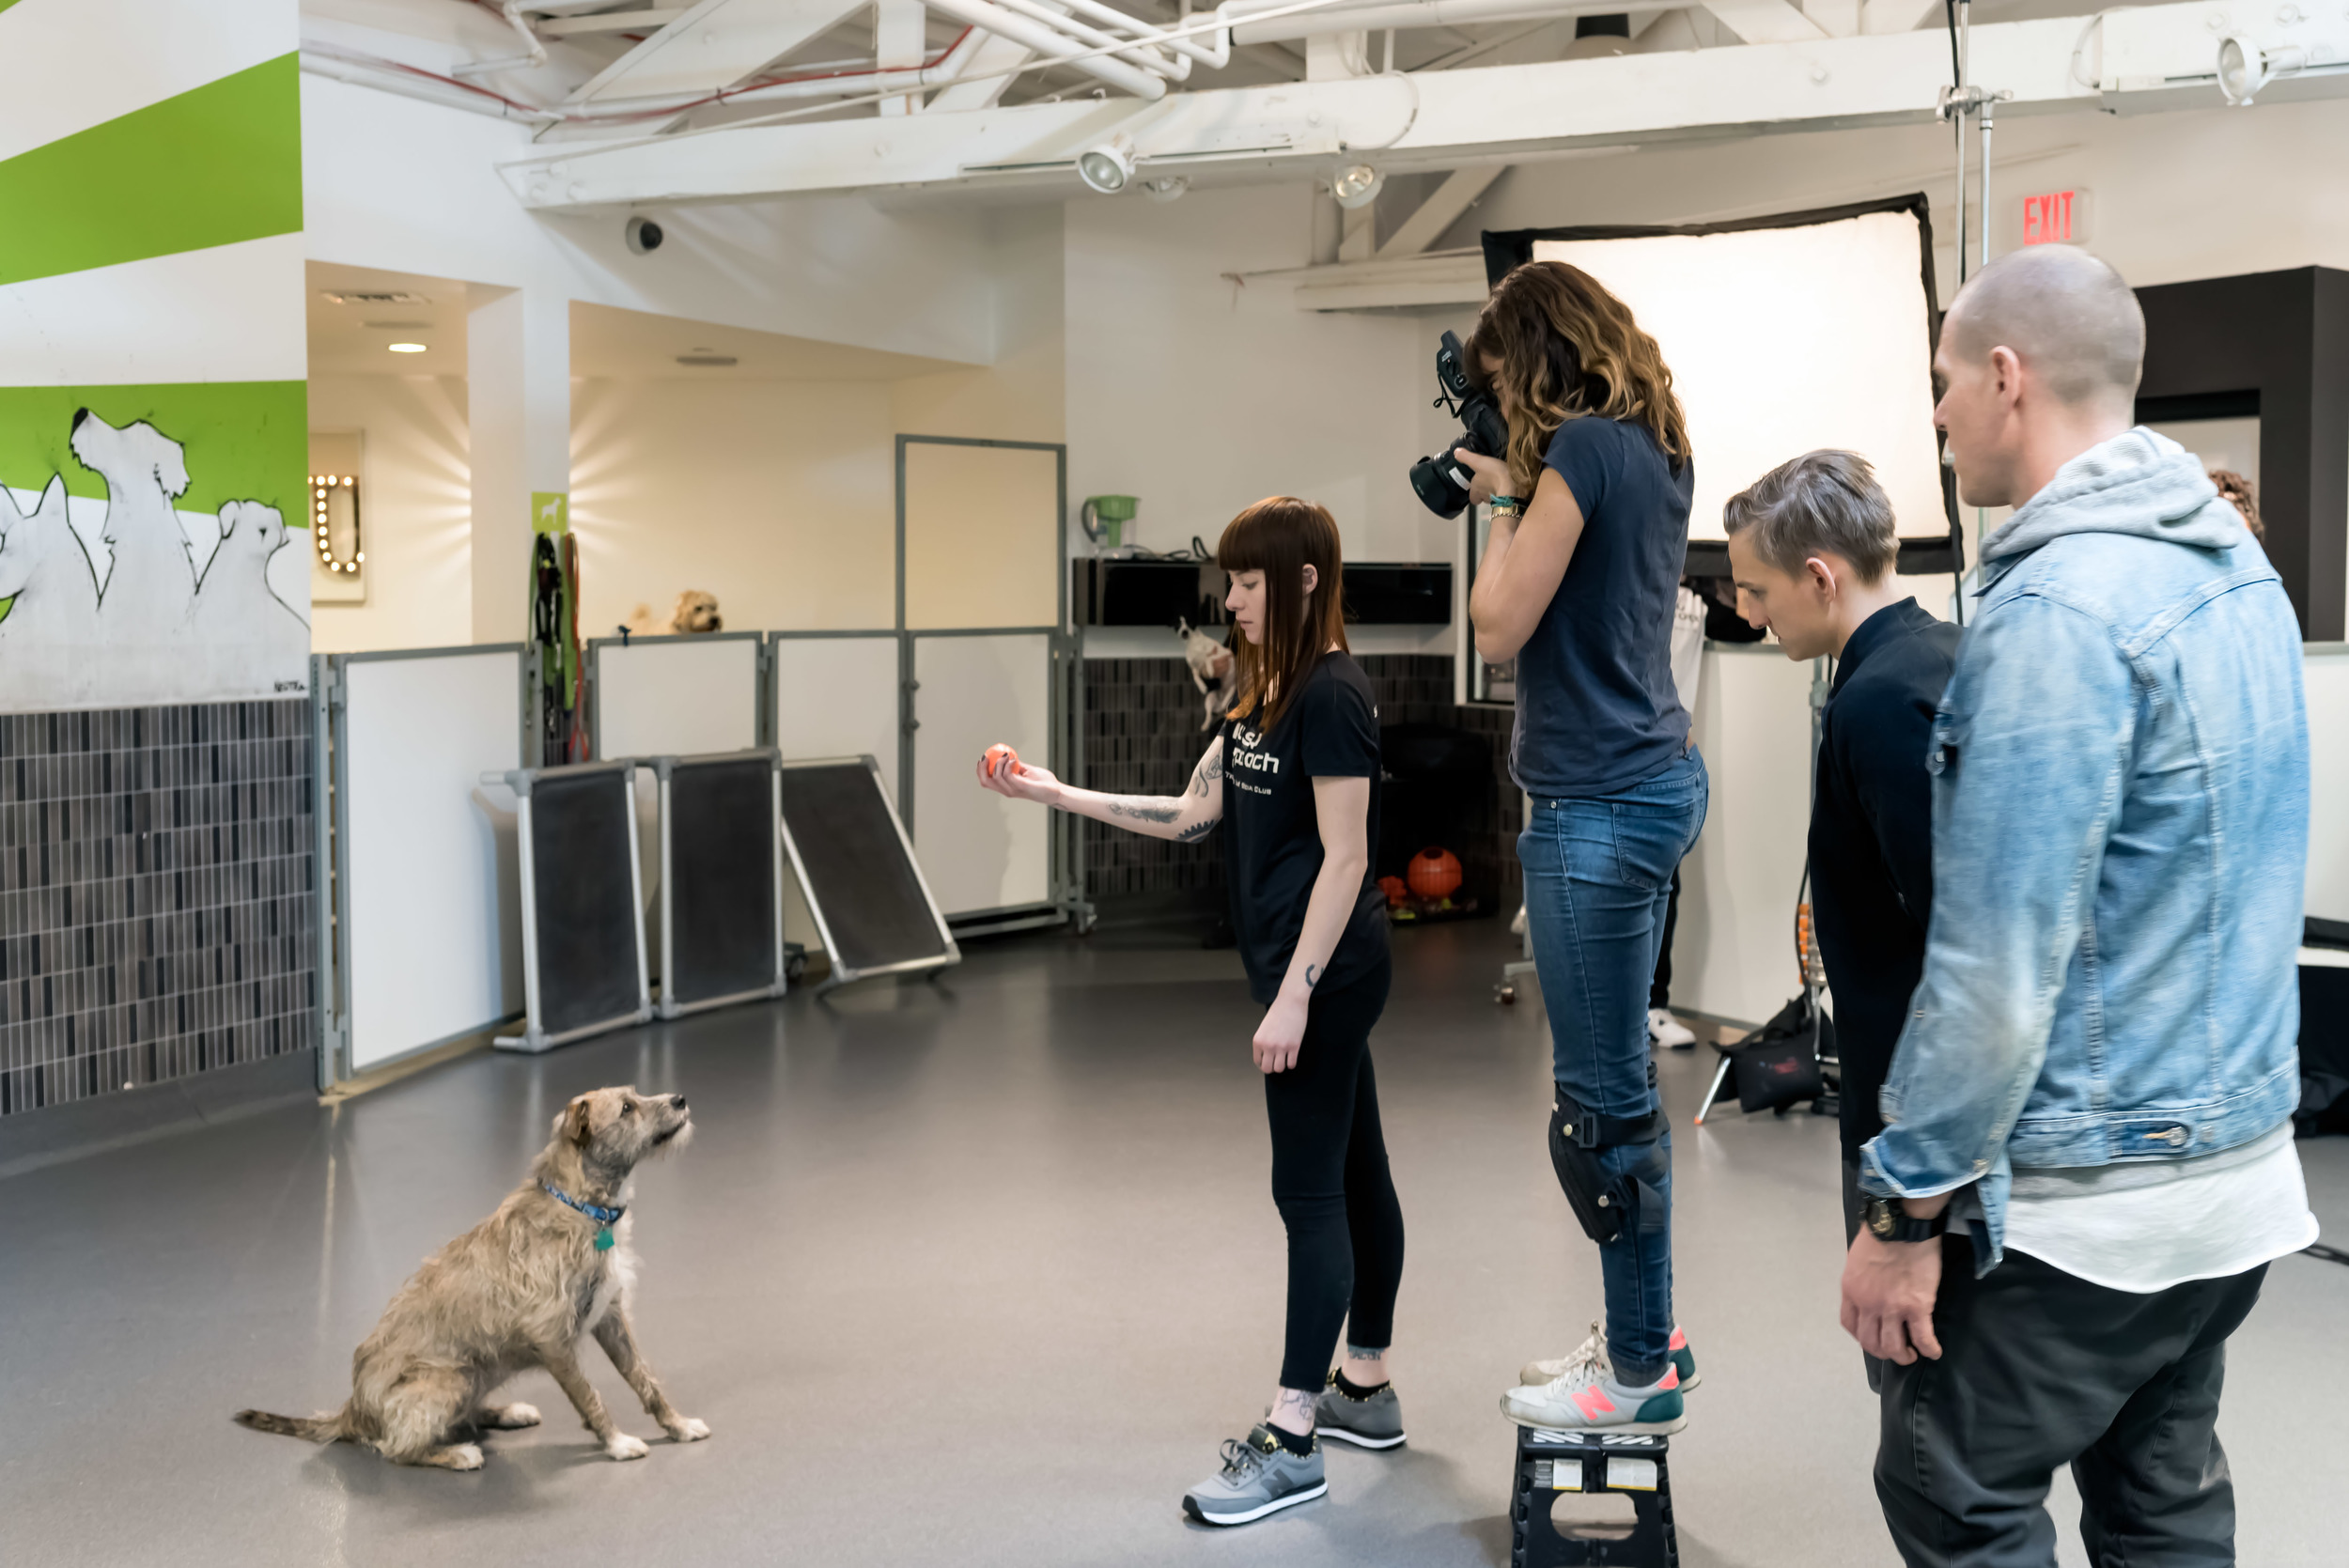 behind-the-scenes-dog-photographer-working-on-set-6.jpg